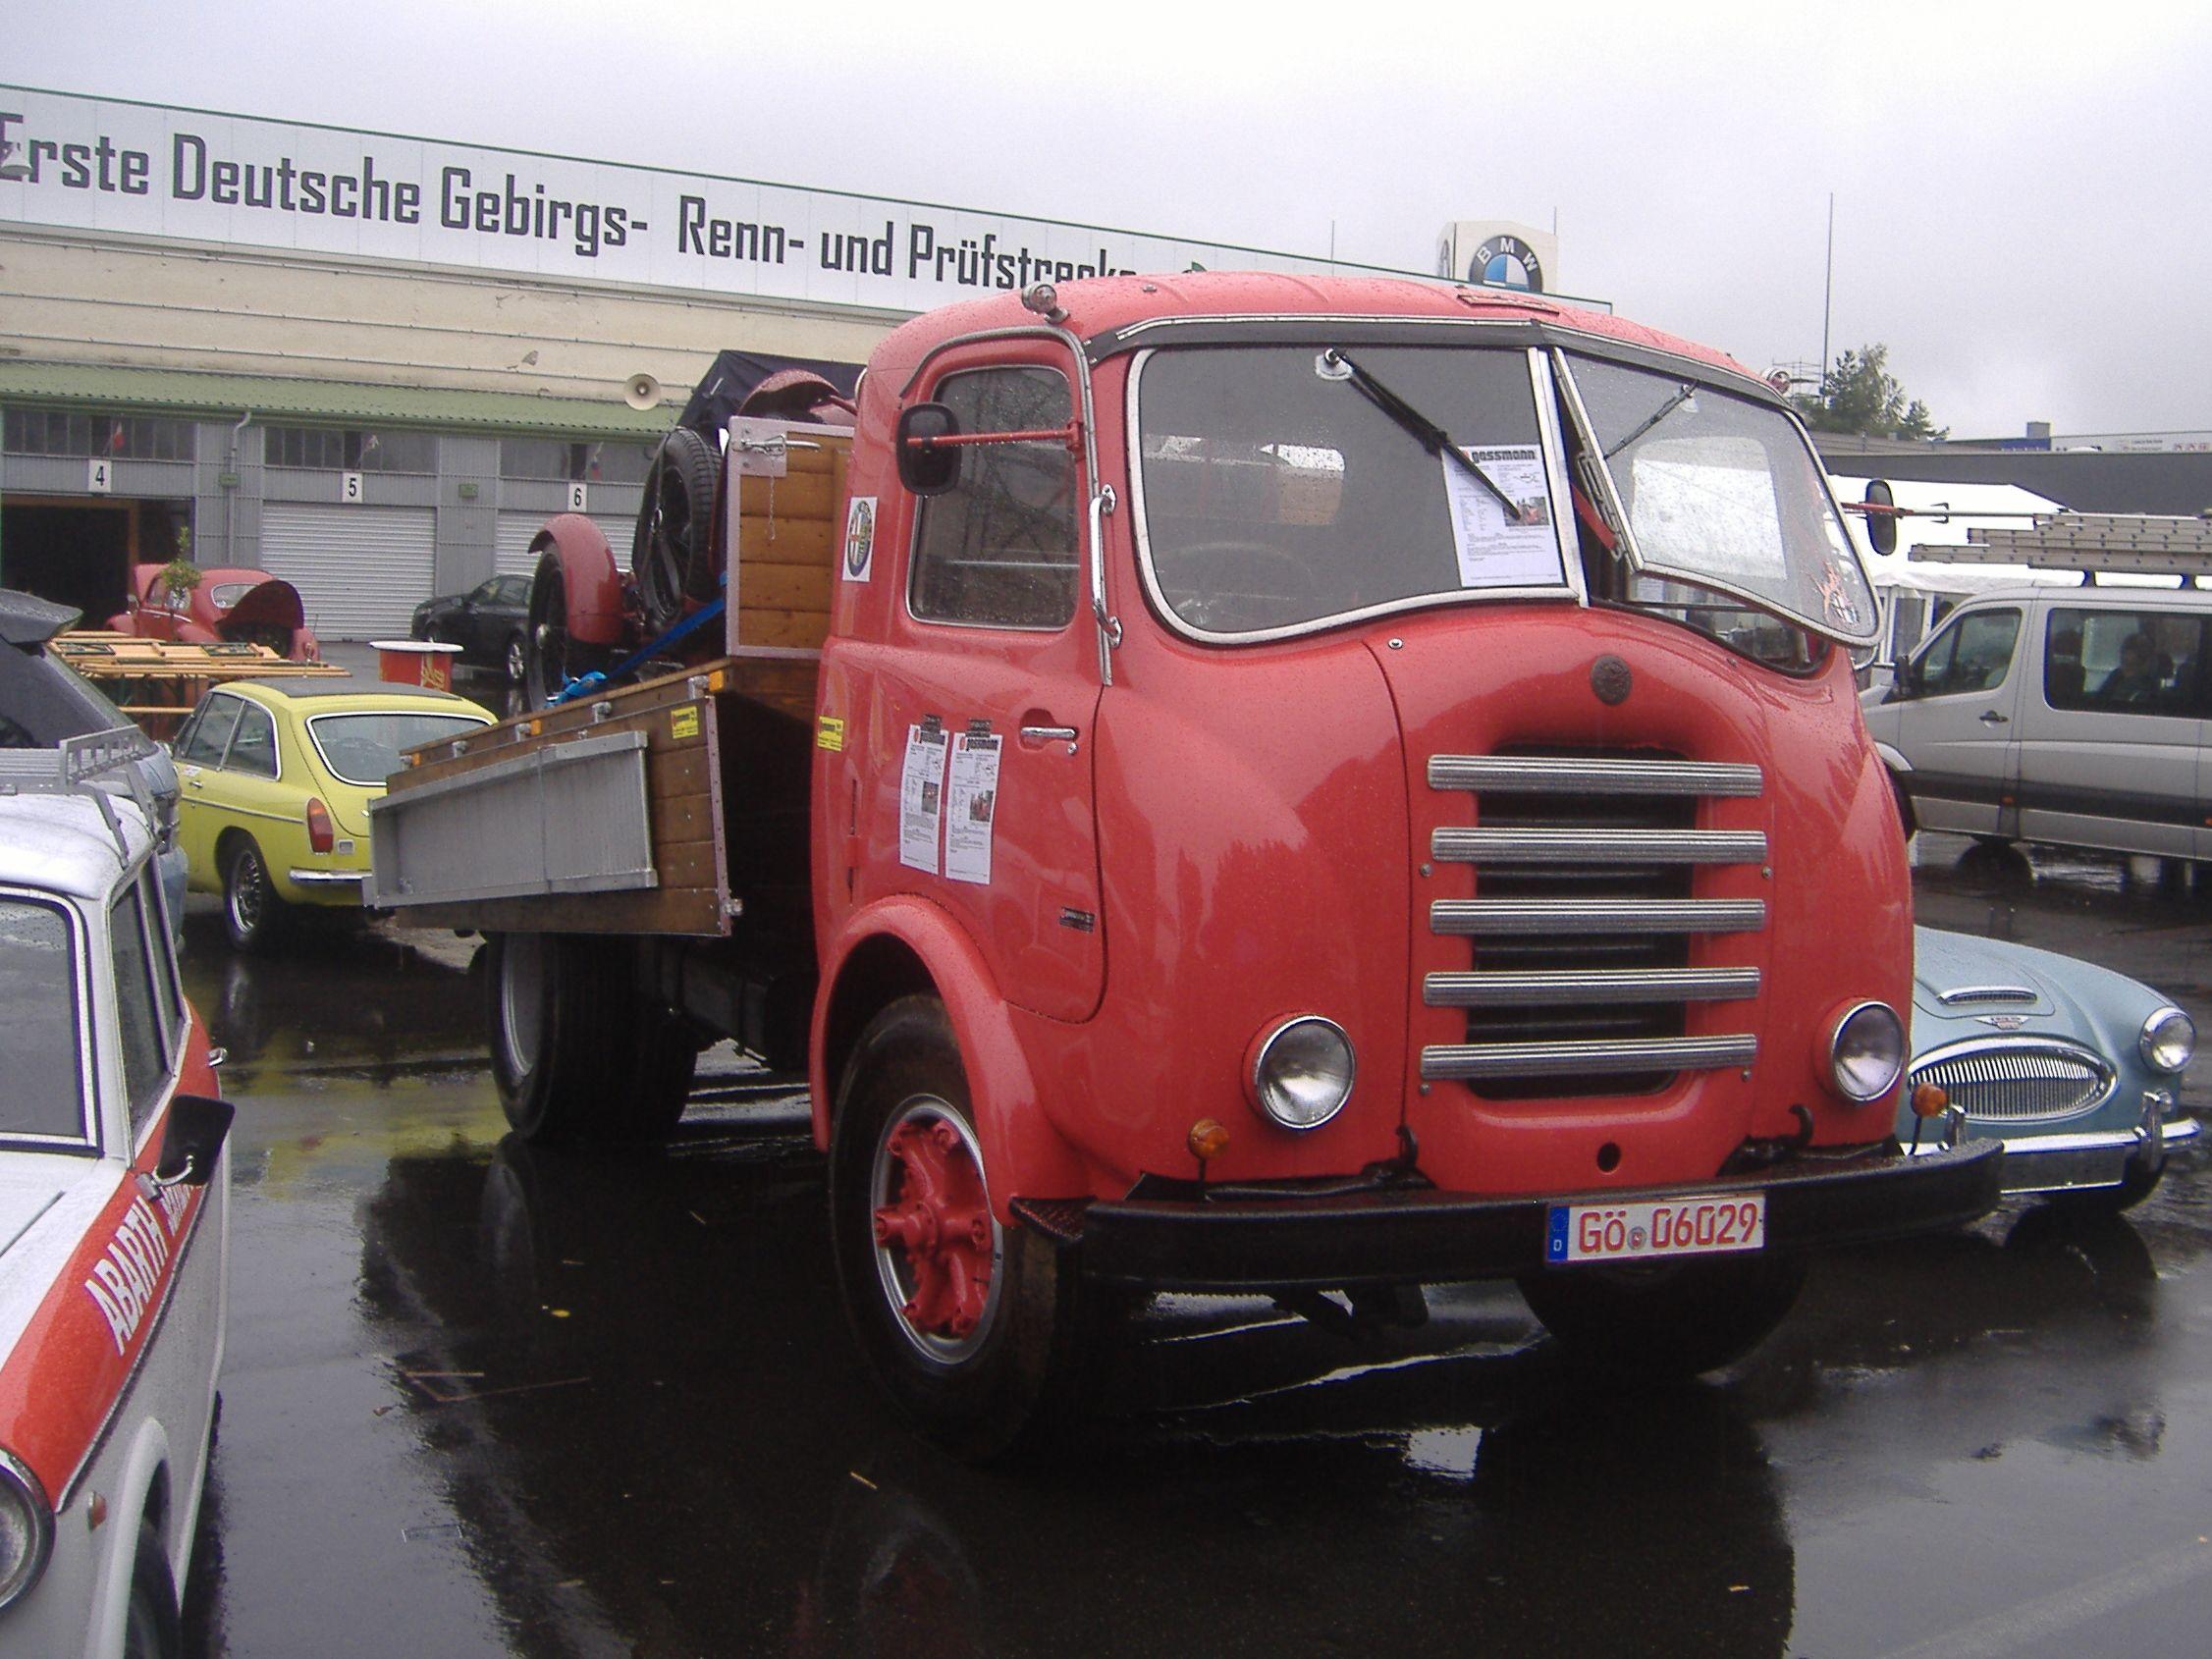 Shortbus deutsch